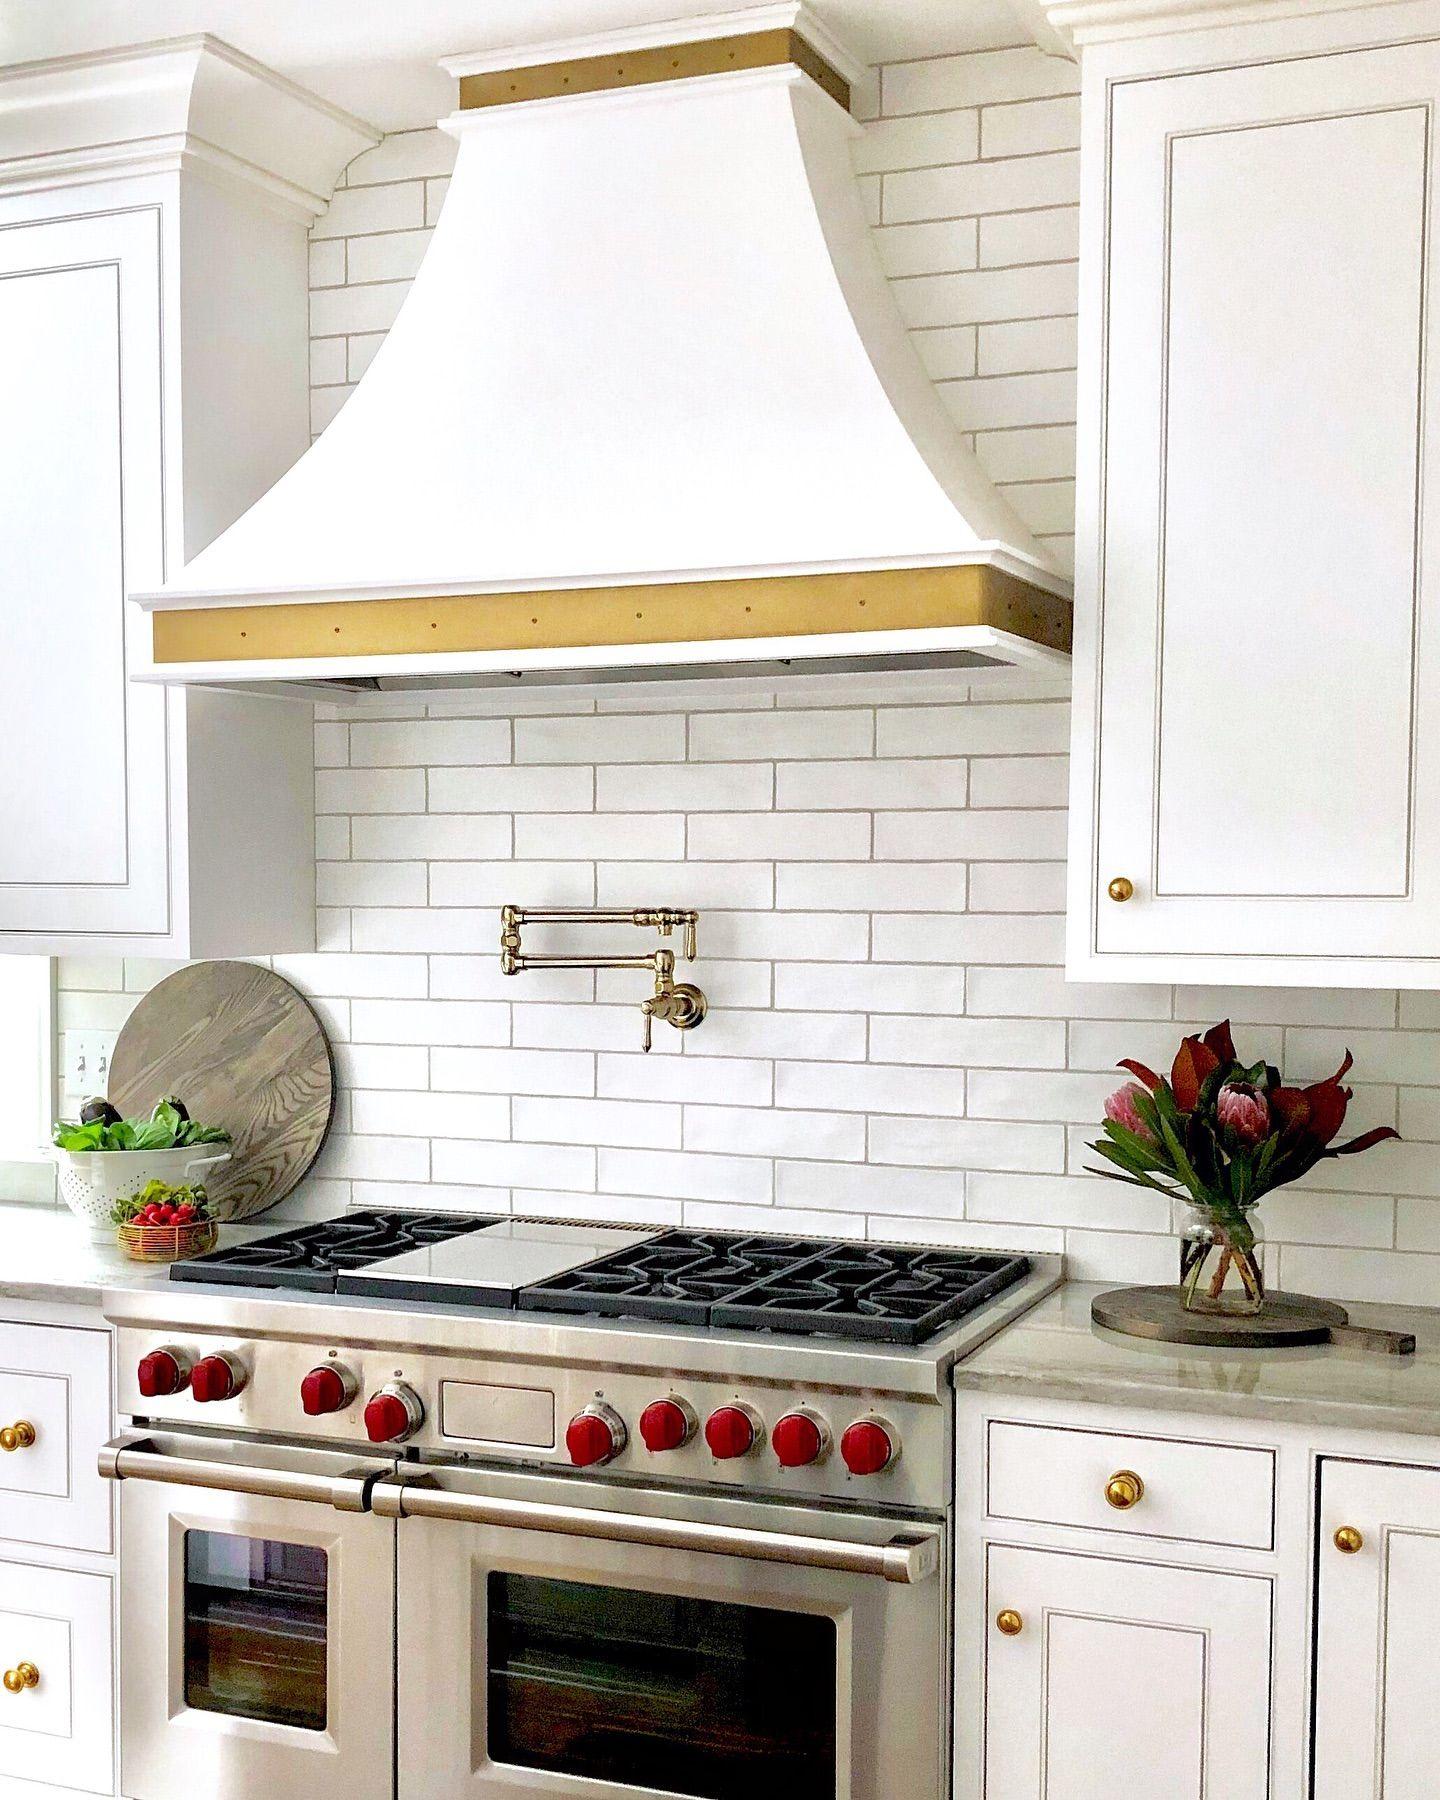 Ann Sacks Arcilla Tile Google Search Round Mirror Bathroom New Home Designs Design Ann sacks kitchen backsplash